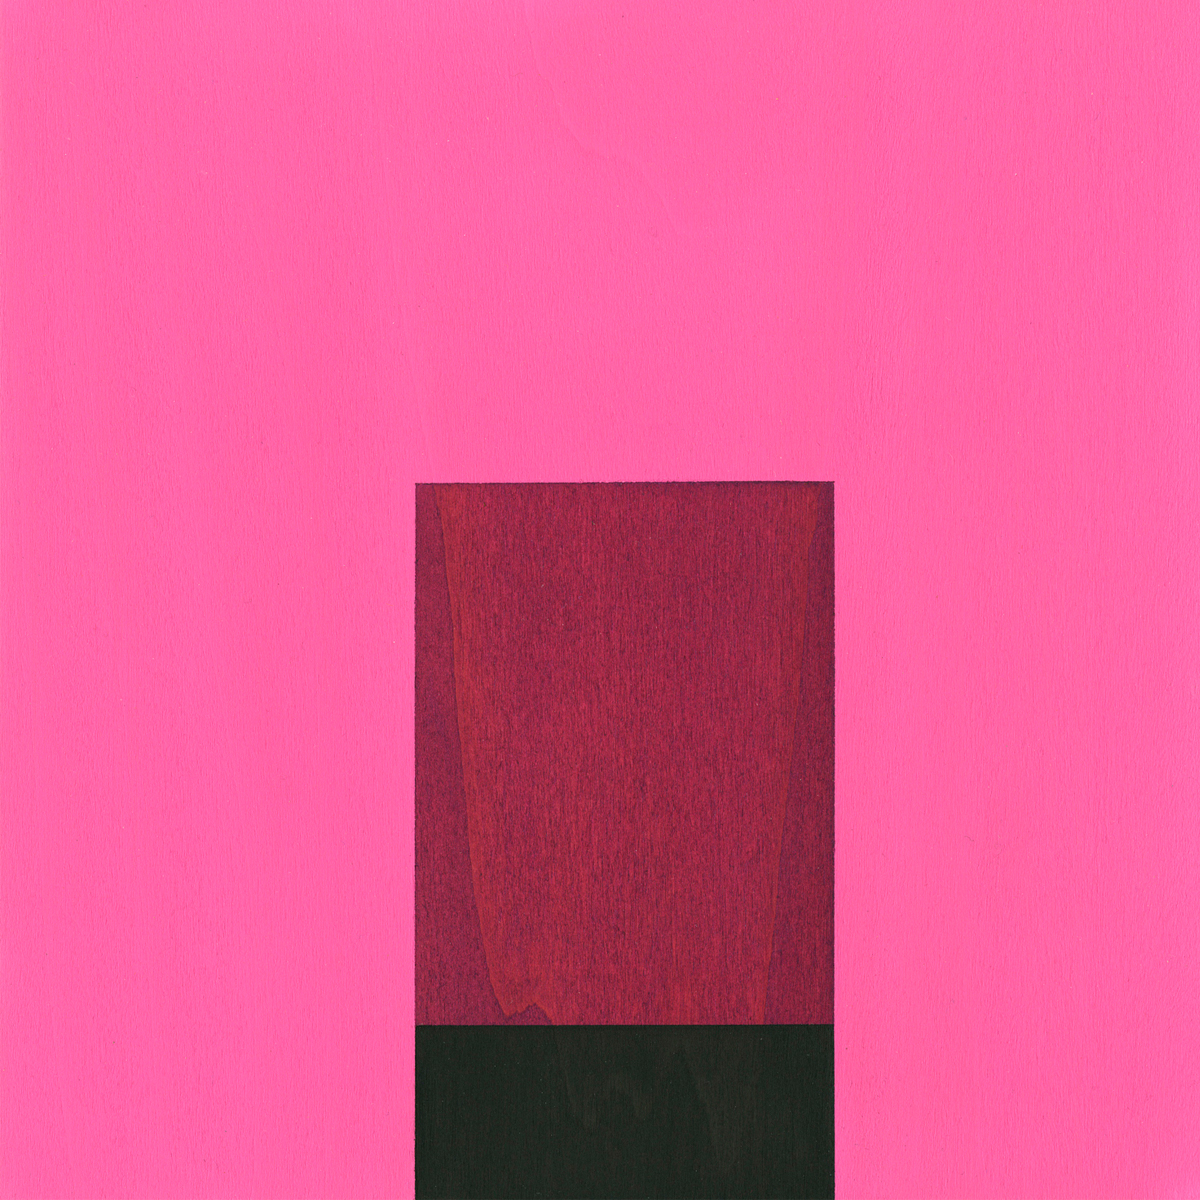 "Heart #1      Gouache / Wood     8.5"" x 8.5"" x 1""     2005"